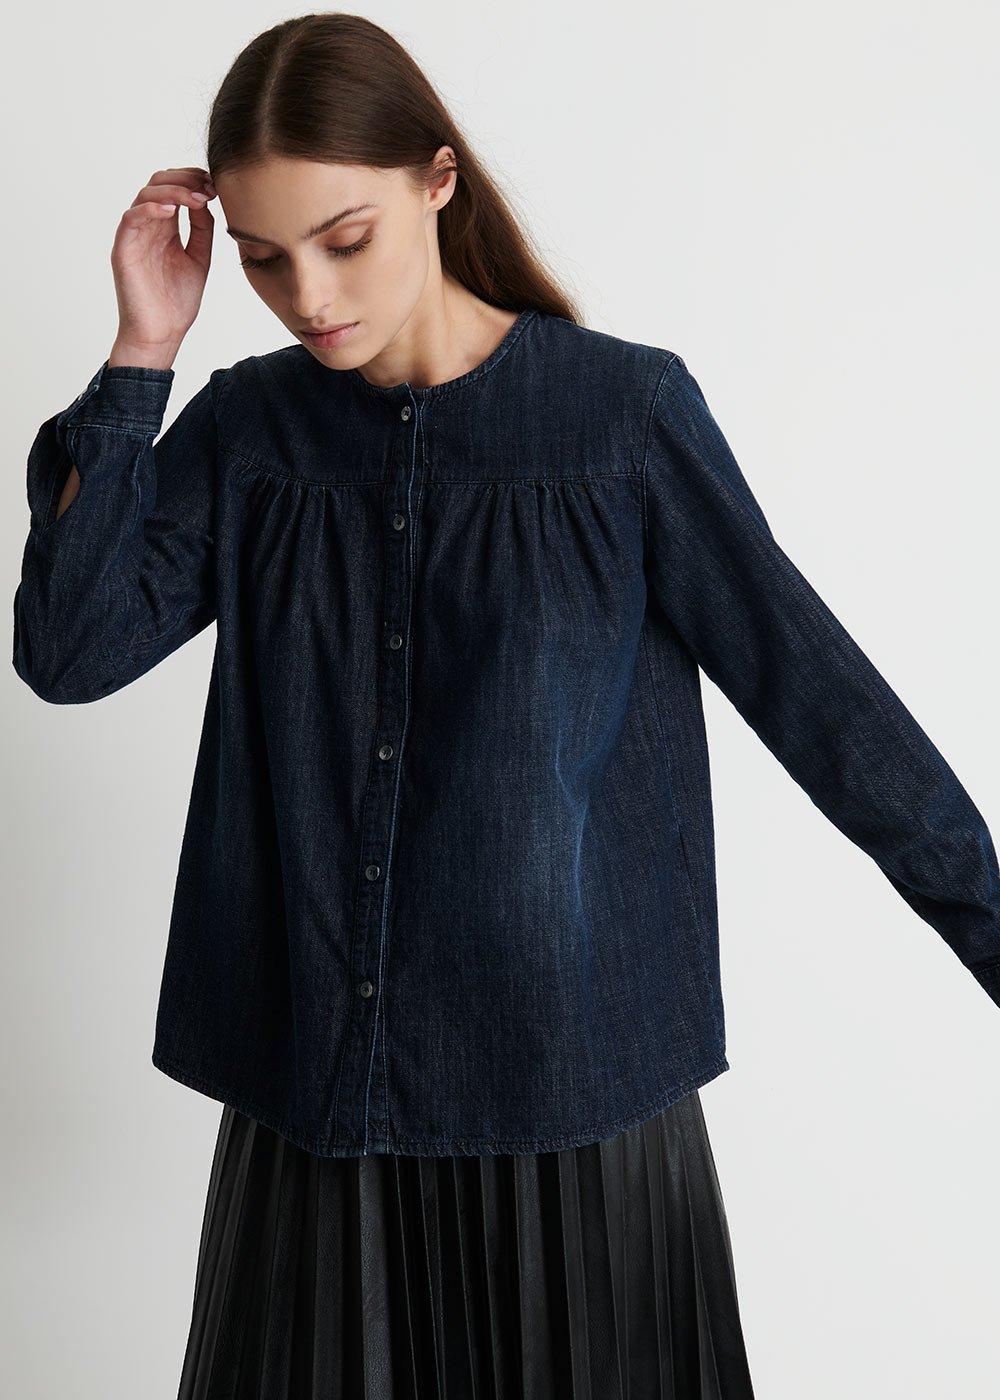 Camilla Denim Crewneck Shirt with Pince - Dark Denim - Woman